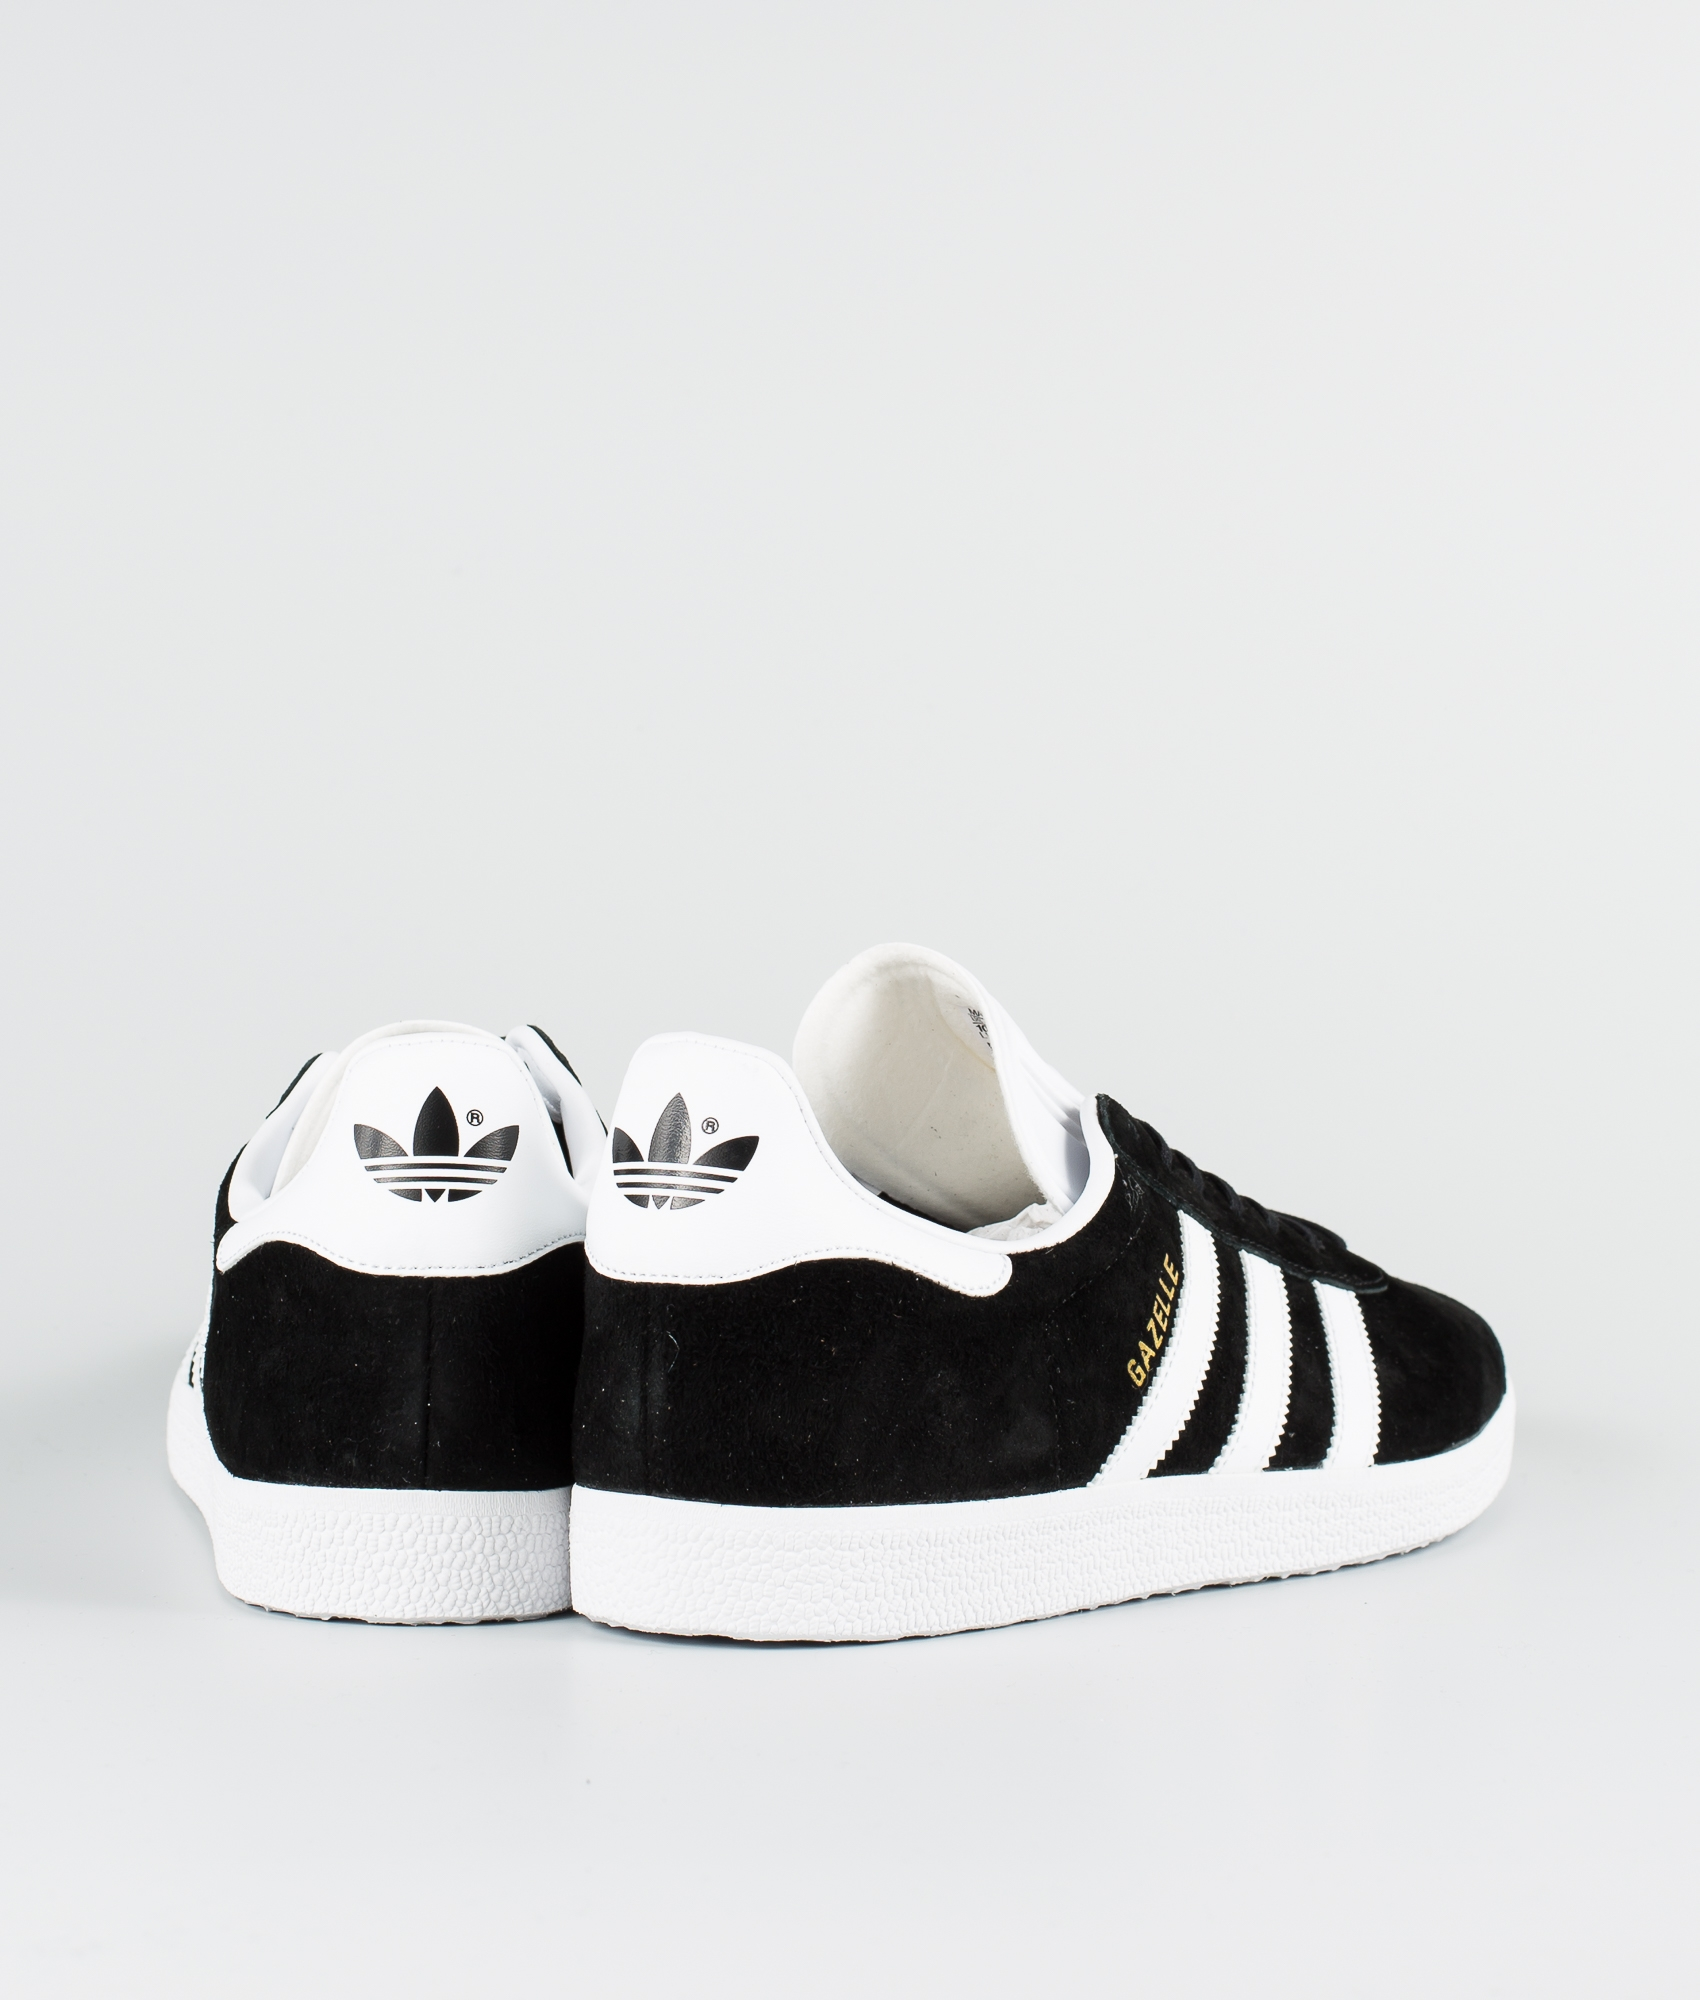 Adidas Originals Gazelle Sko Core BlackWhiteGoldmt